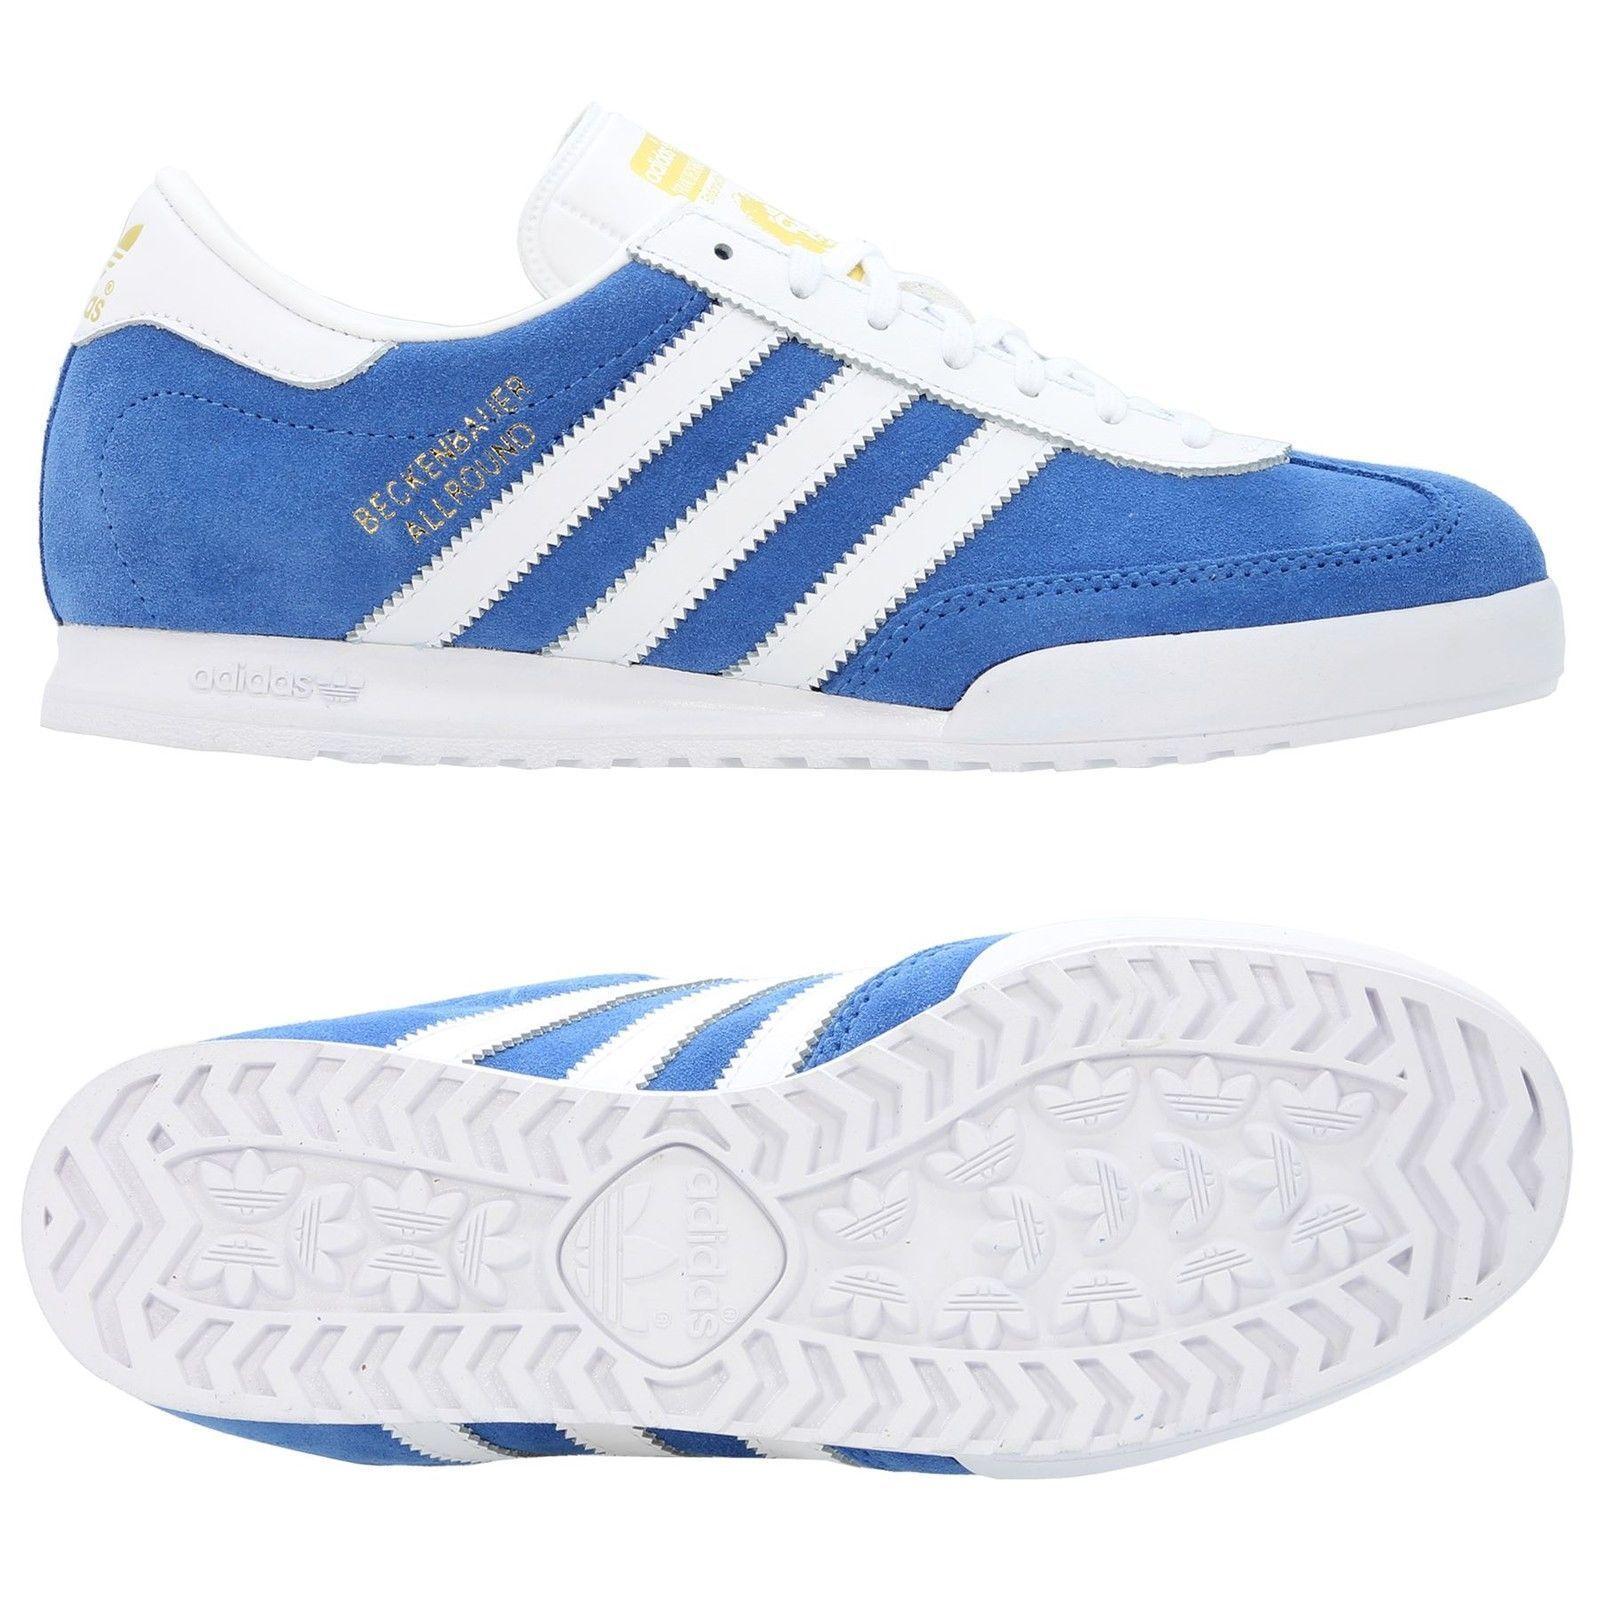 NUOVI Pantaloncini Uomo Adidas Beckenbauer All Round Trainer blu Taglia 8 - 12